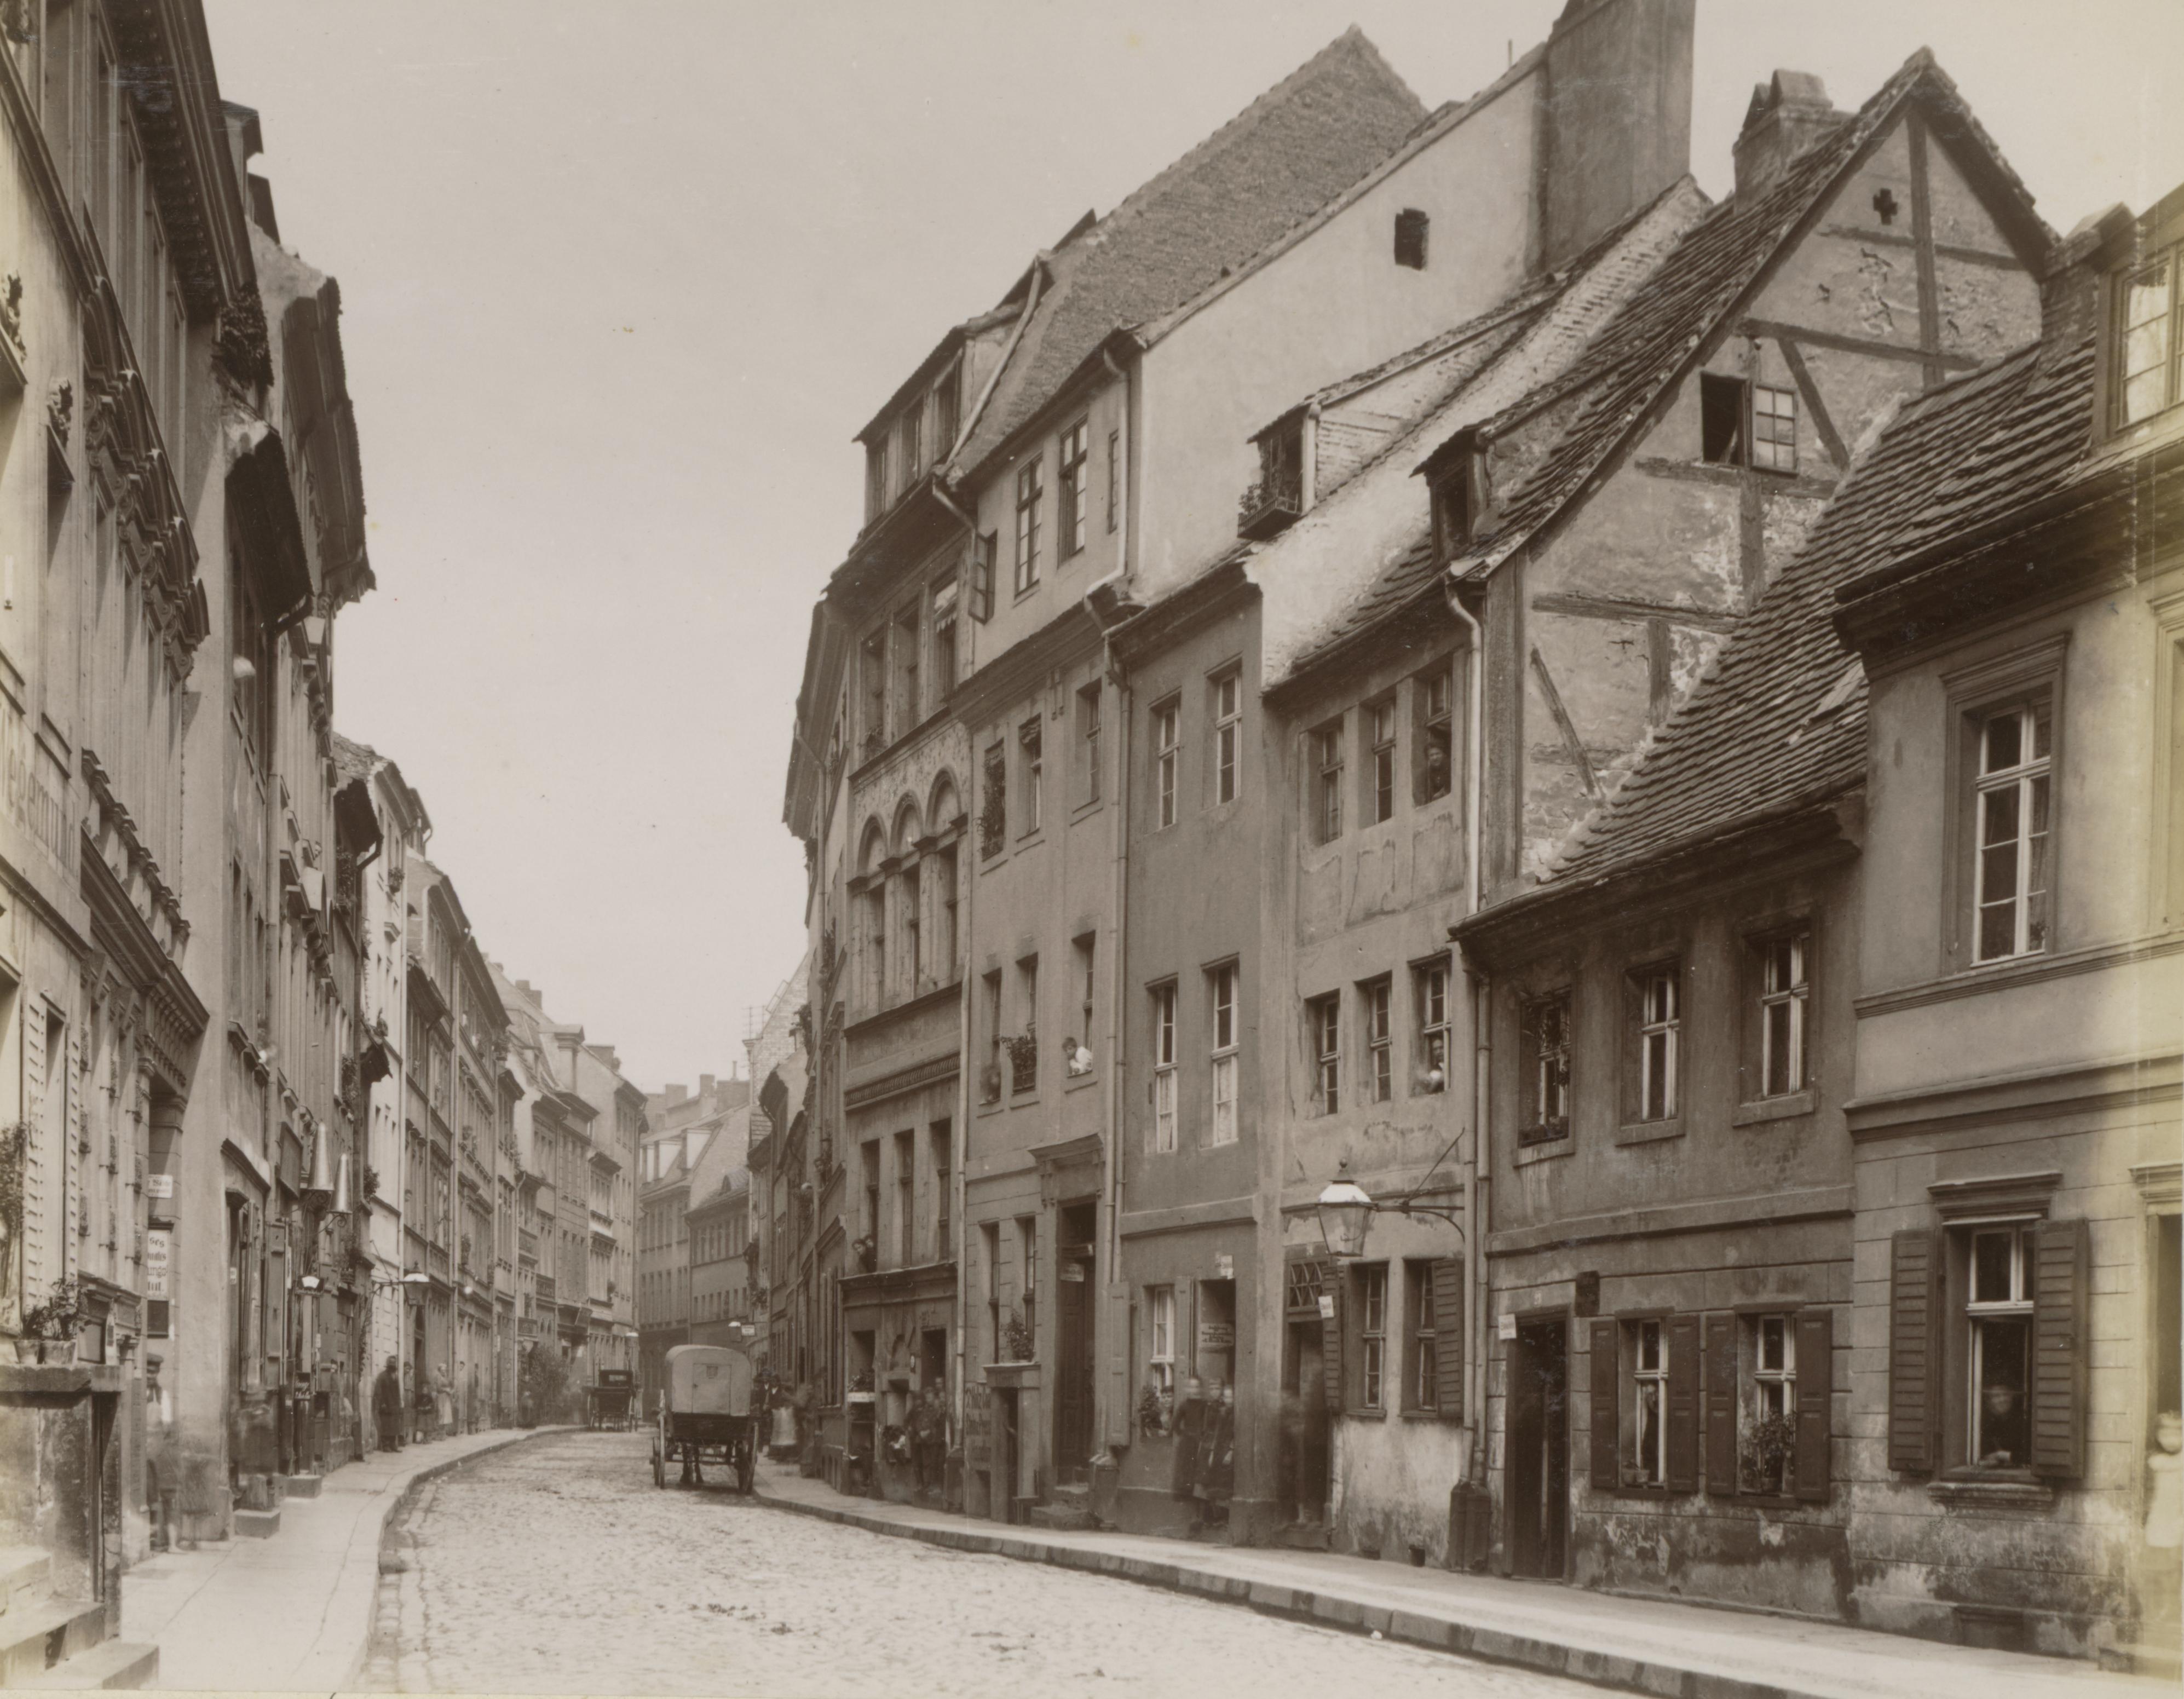 File:Petristraße, Berlin 1880.jpg